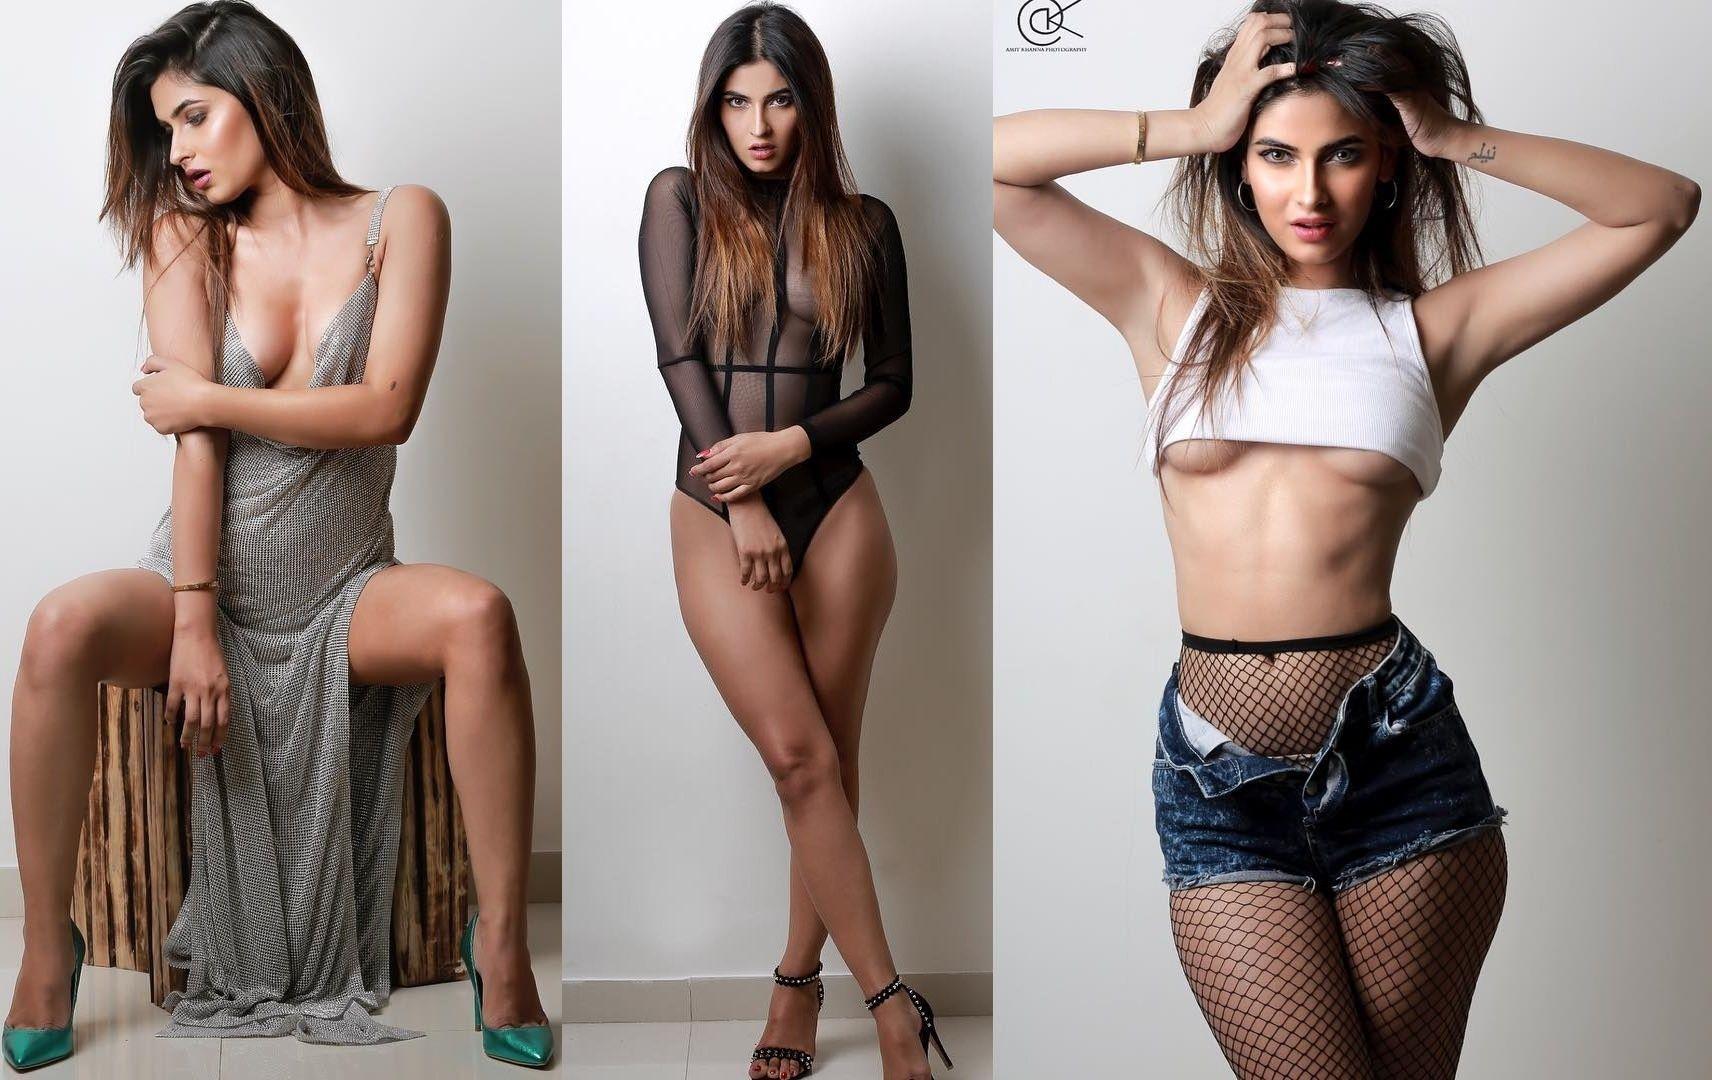 Hondoras nude models